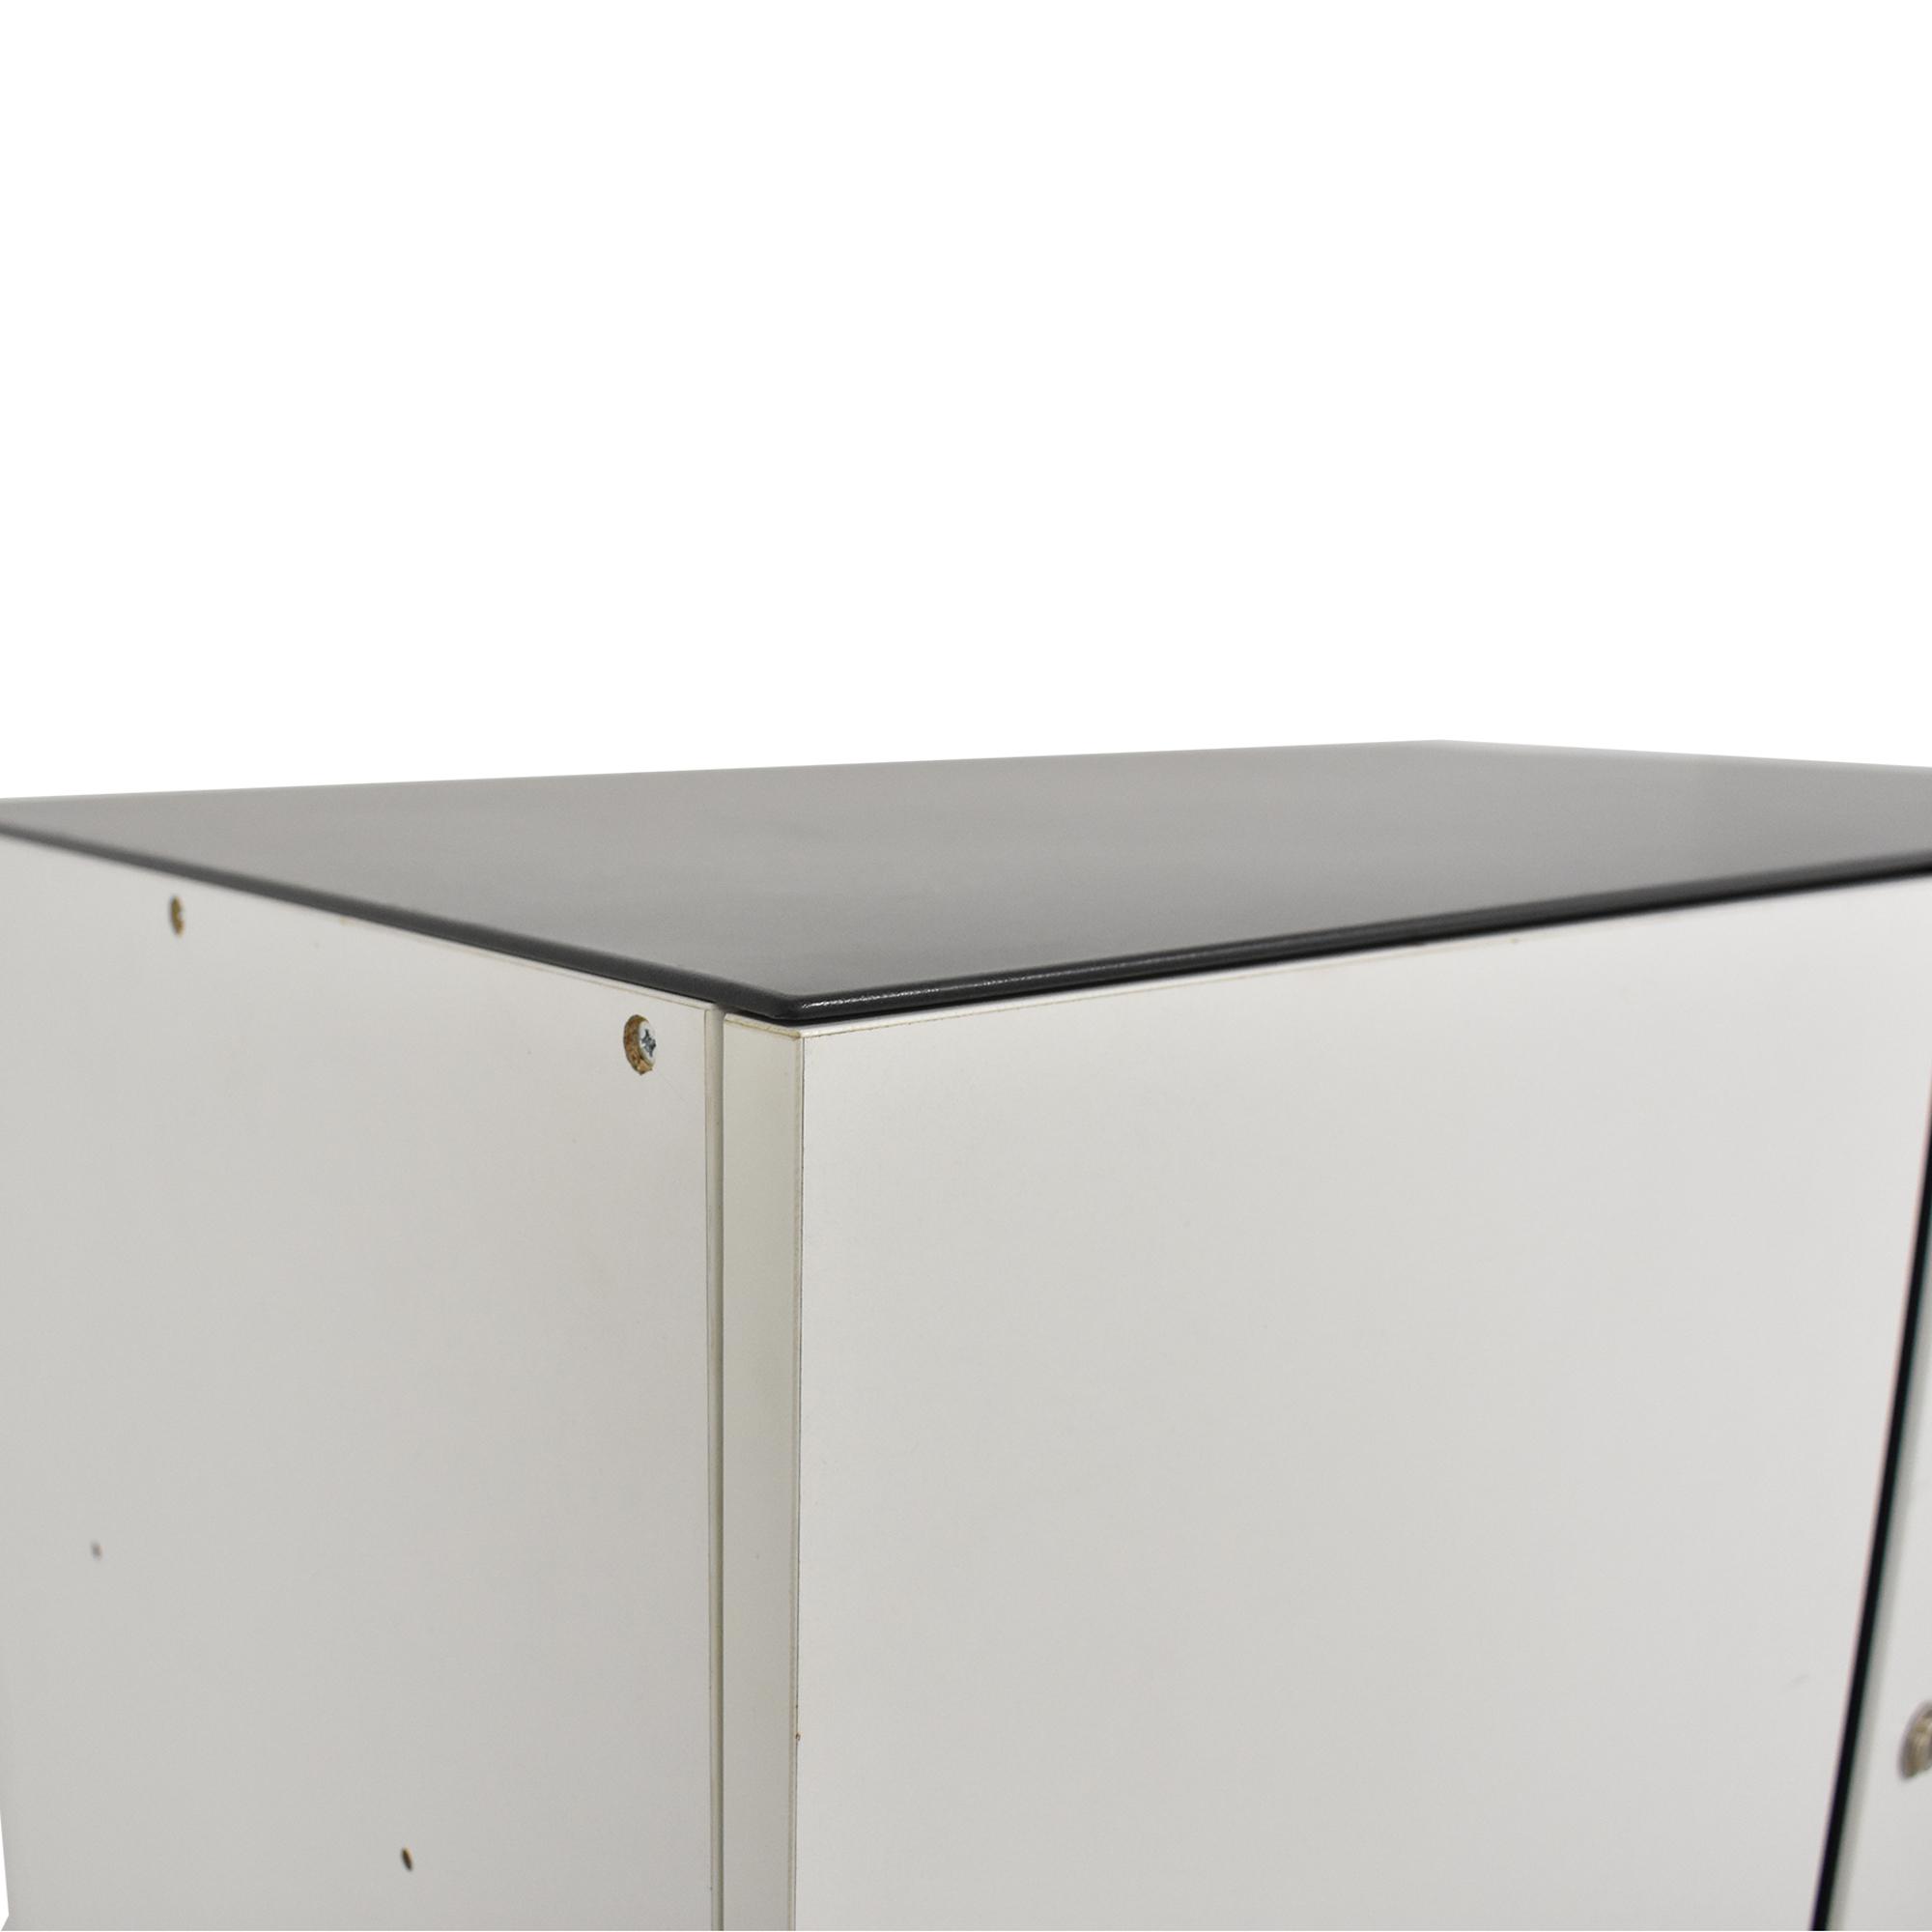 Koleksiyon Koleksiyon Song S2 Storage Cabinet dimensions